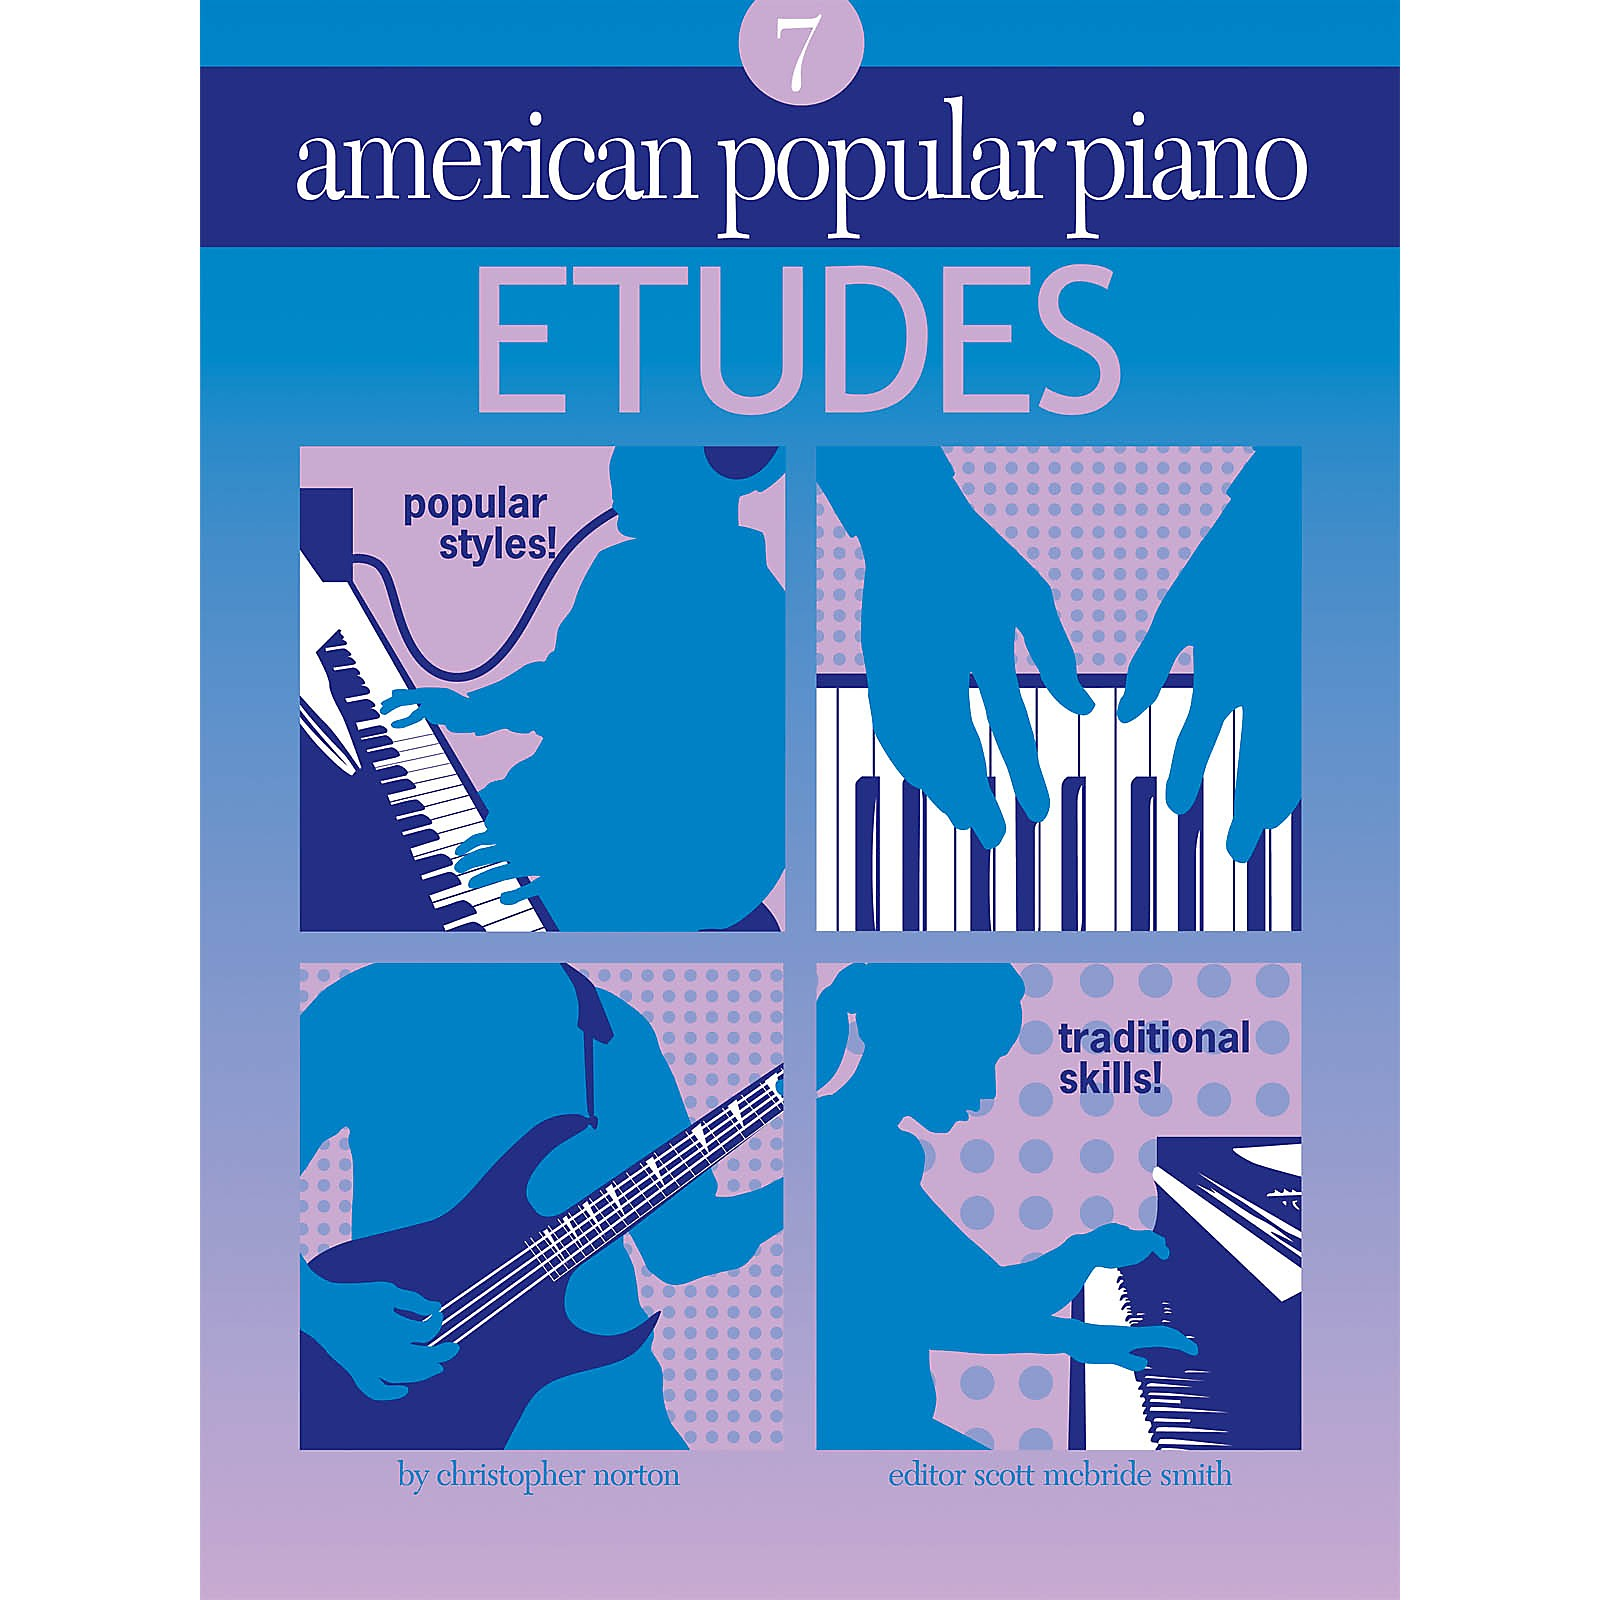 Novus Via American Popular Piano (Etudes Level 7) Novus Via Music Group Series Softcover by Christopher Norton